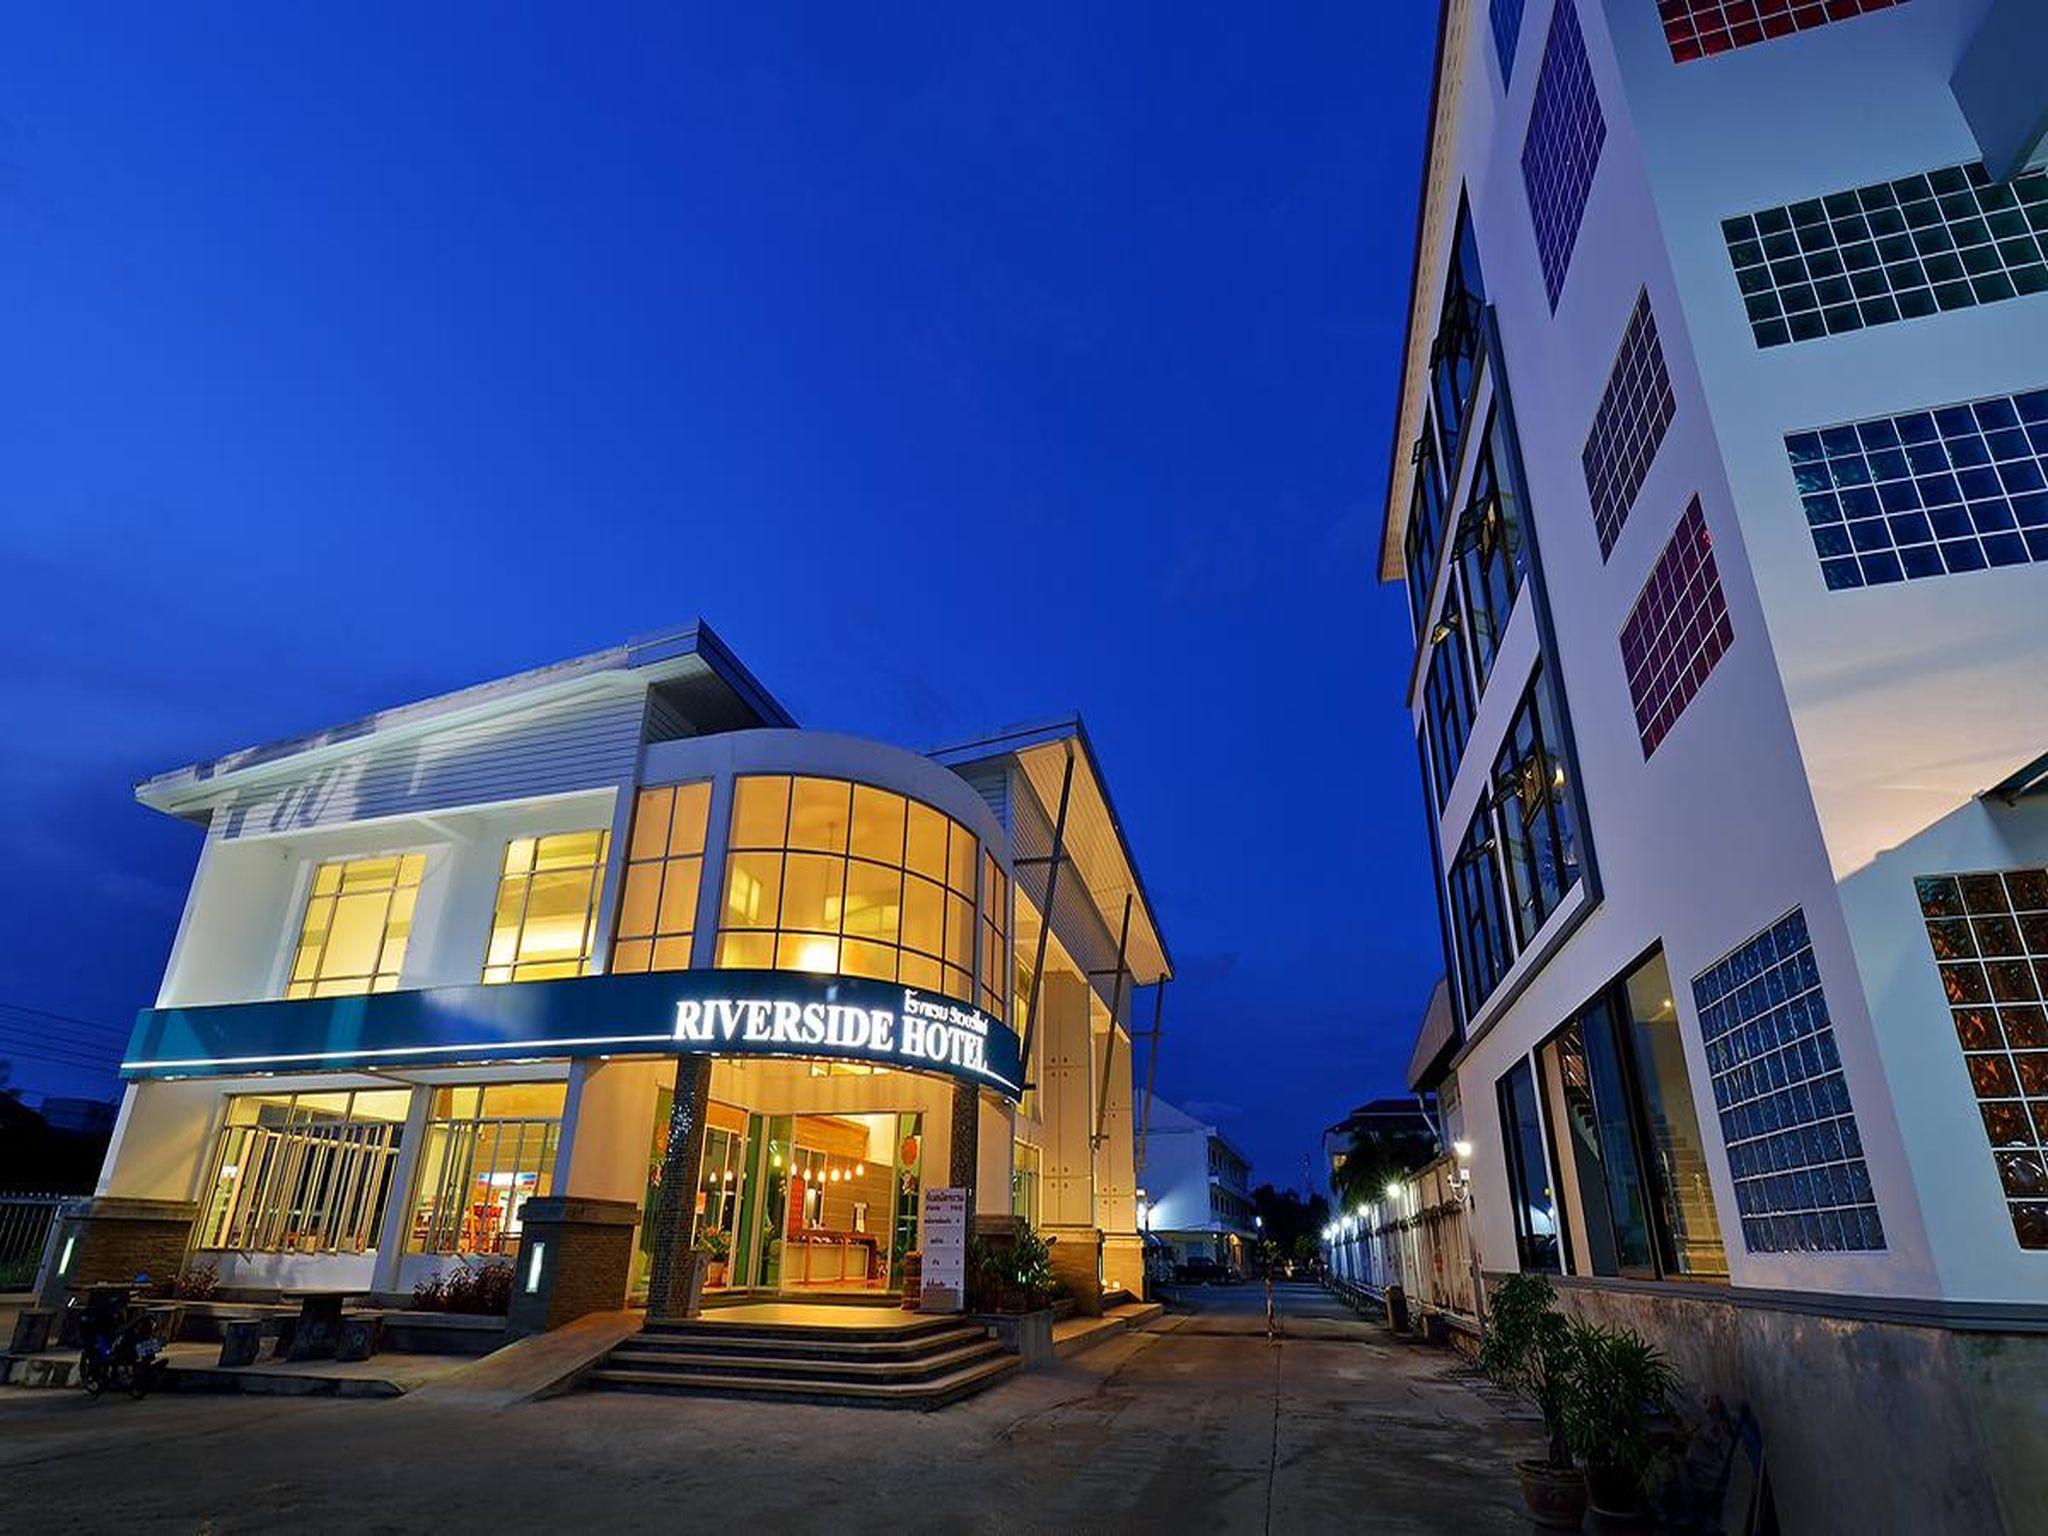 Riverside Hotel โรงแรมริเวอร์ไซด์